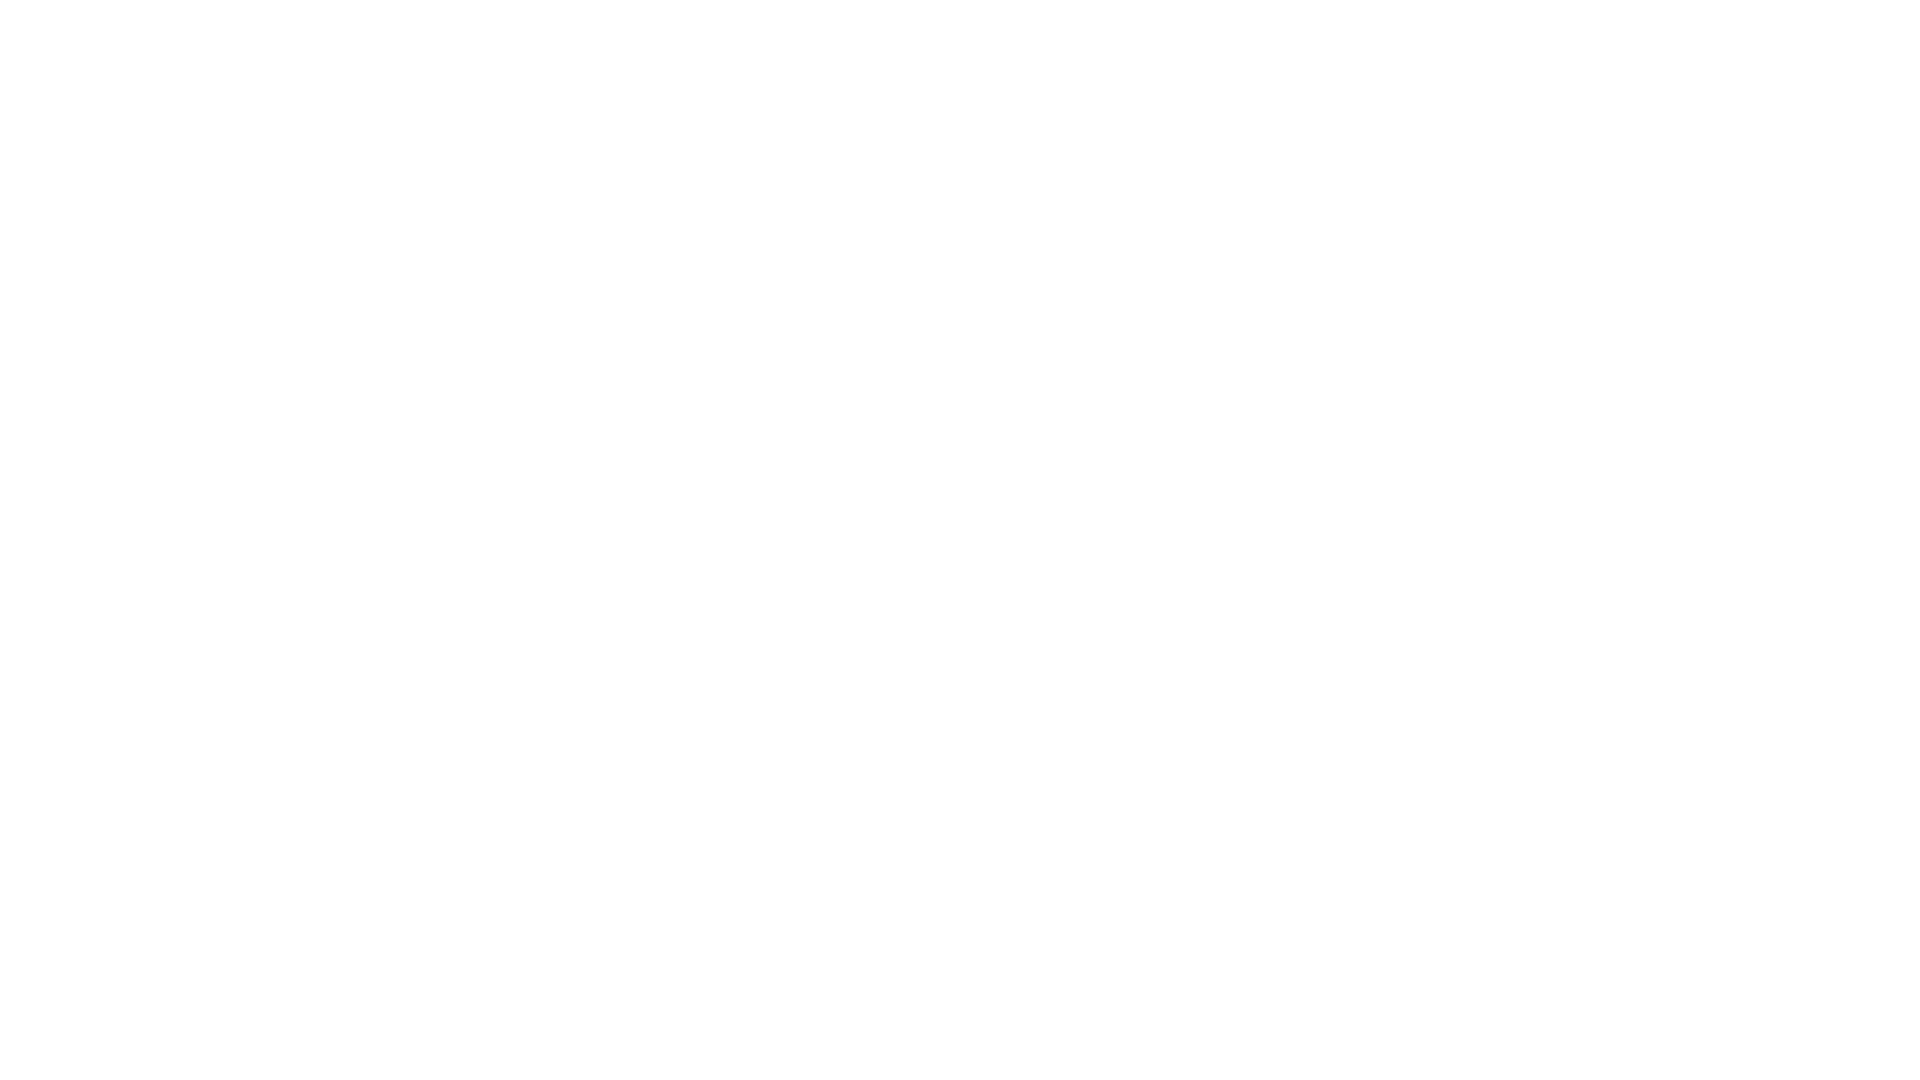 Transparent-img